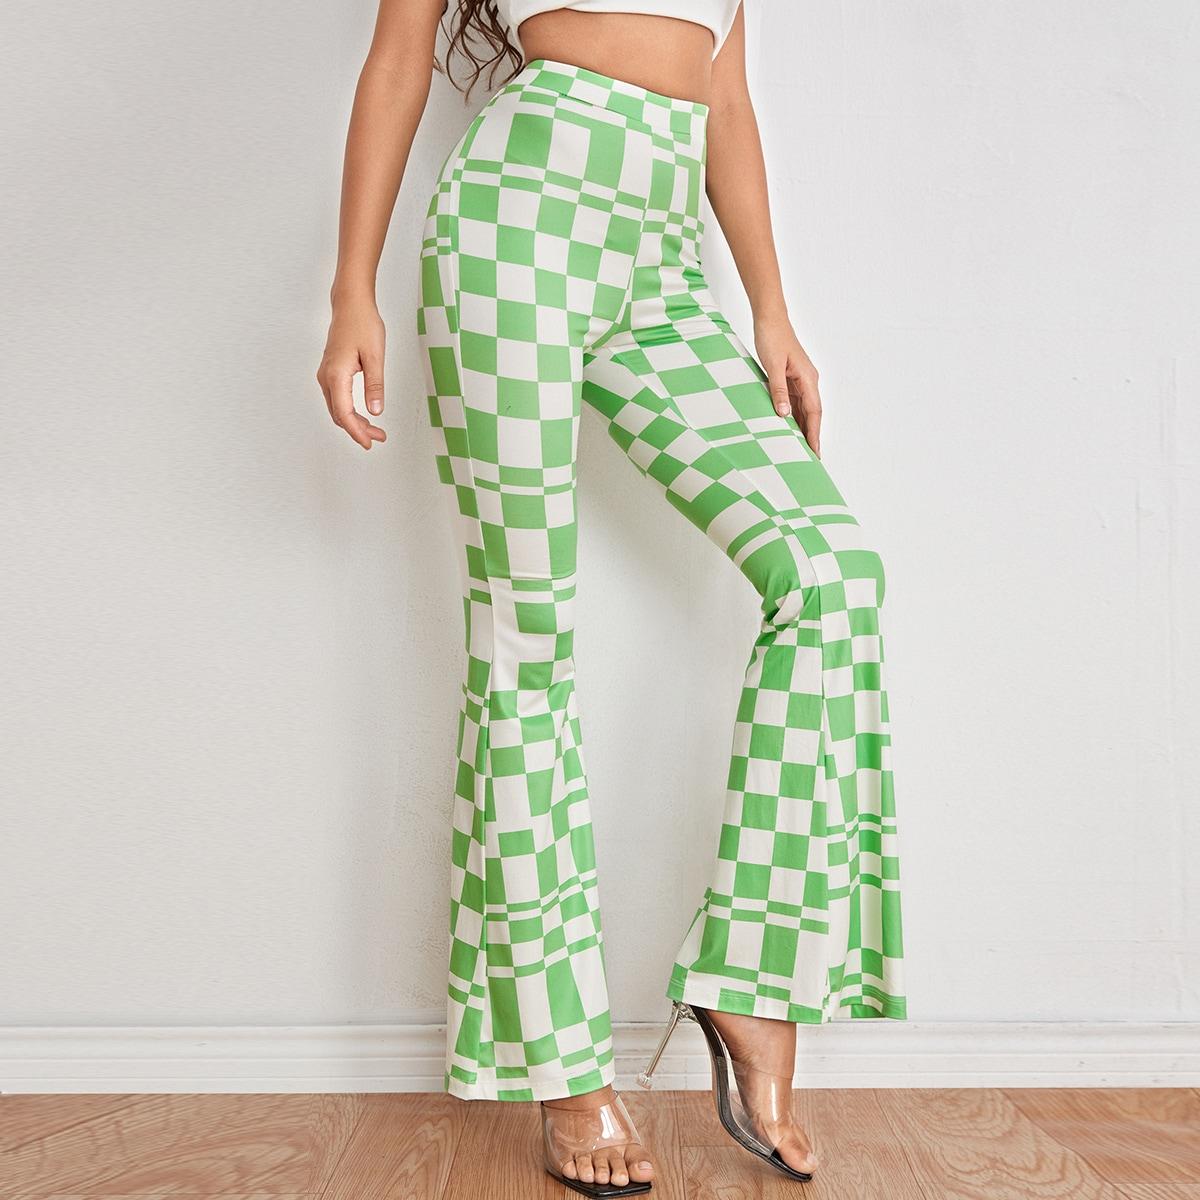 High Waist Geo Print Flare Leg Pants, SHEIN  - buy with discount